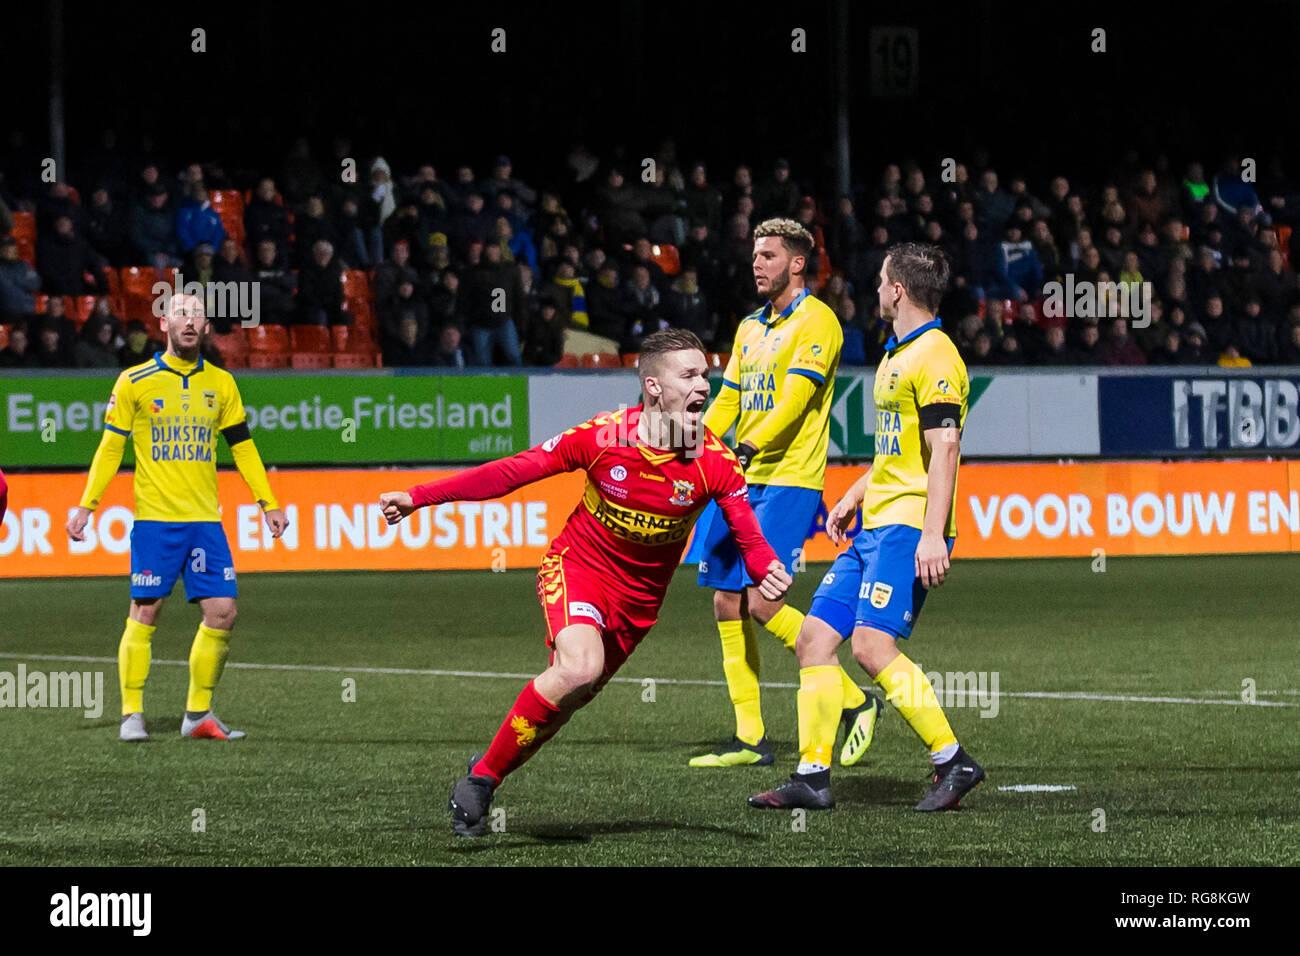 Leeuwarden Netherlands 28th January 2019 Netherlands 28th January 2019 Cambuur Stadium 28 01 2019 Season 2018